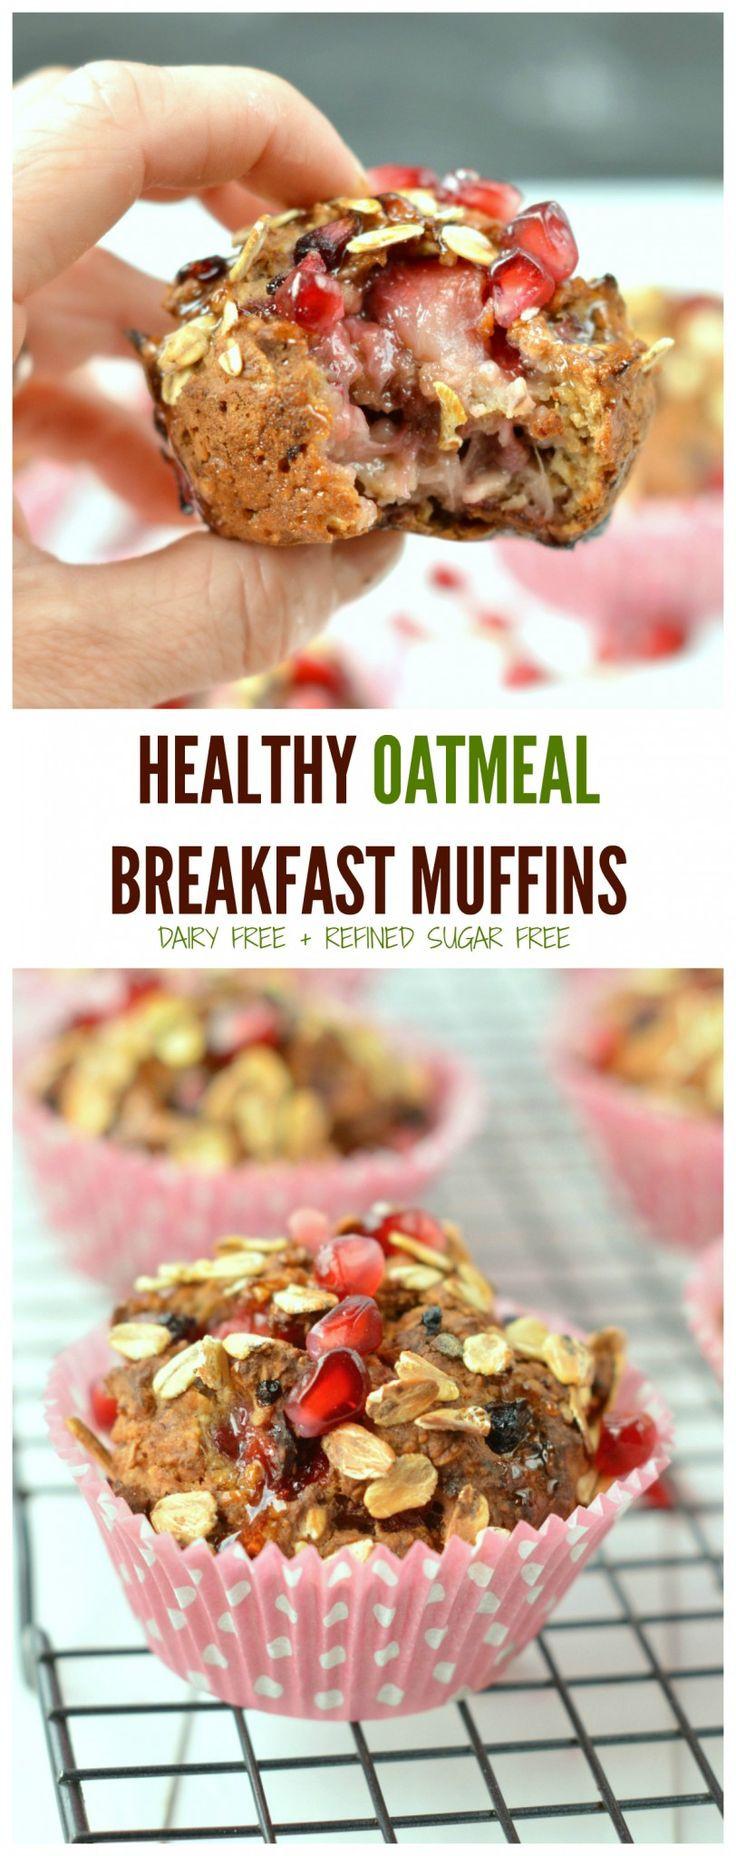 Healthy Breakfast Muffins Recipe  Healthy Oatmeal Breakfast Muffin Recipe